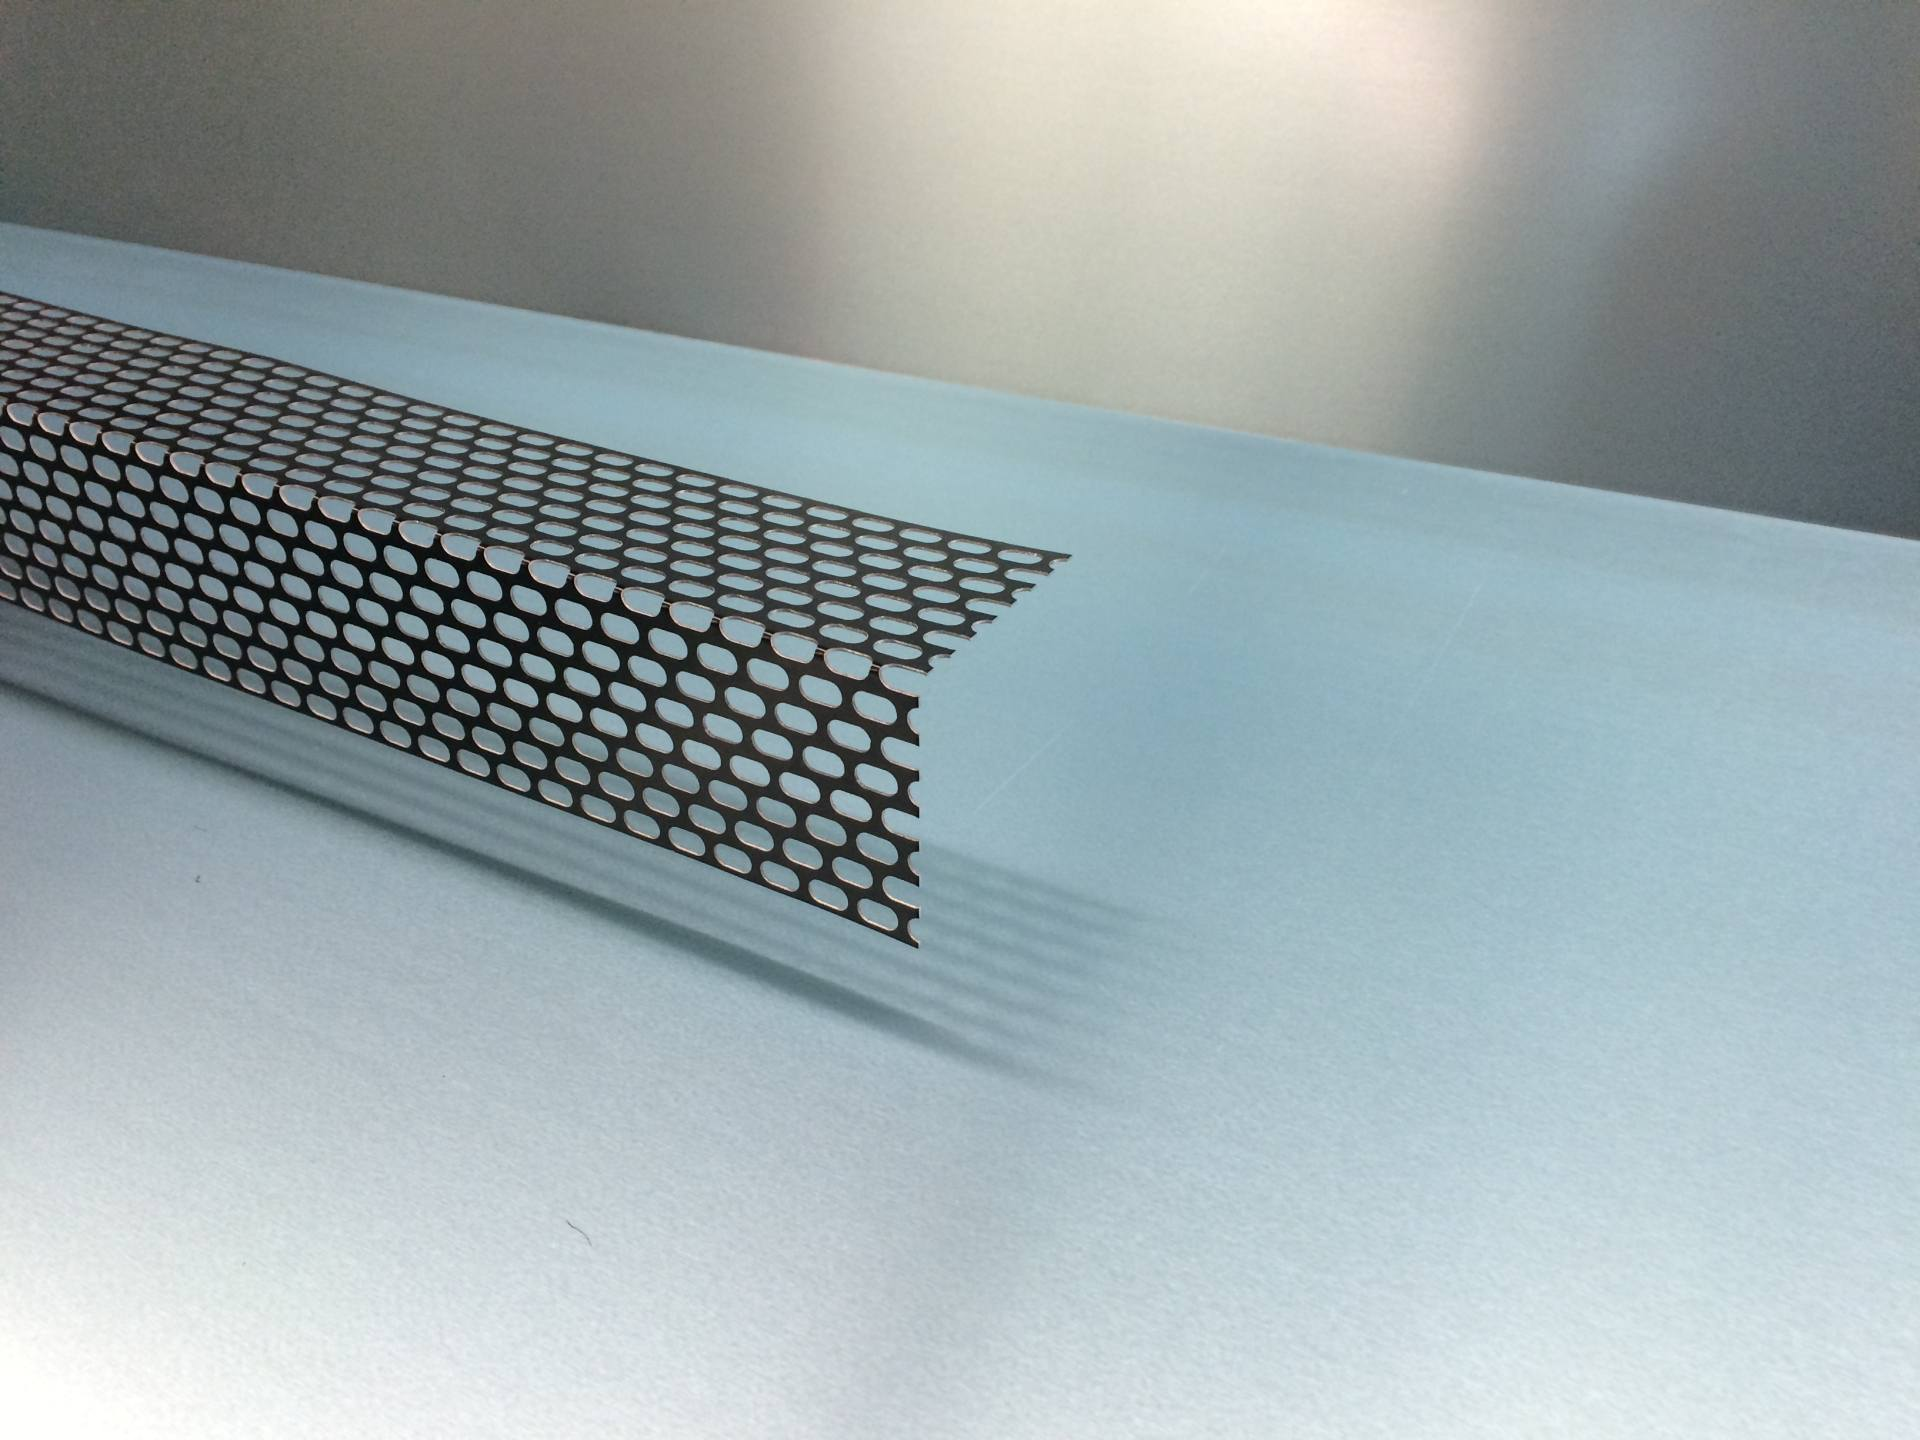 Lochblechwinkel Aluminium